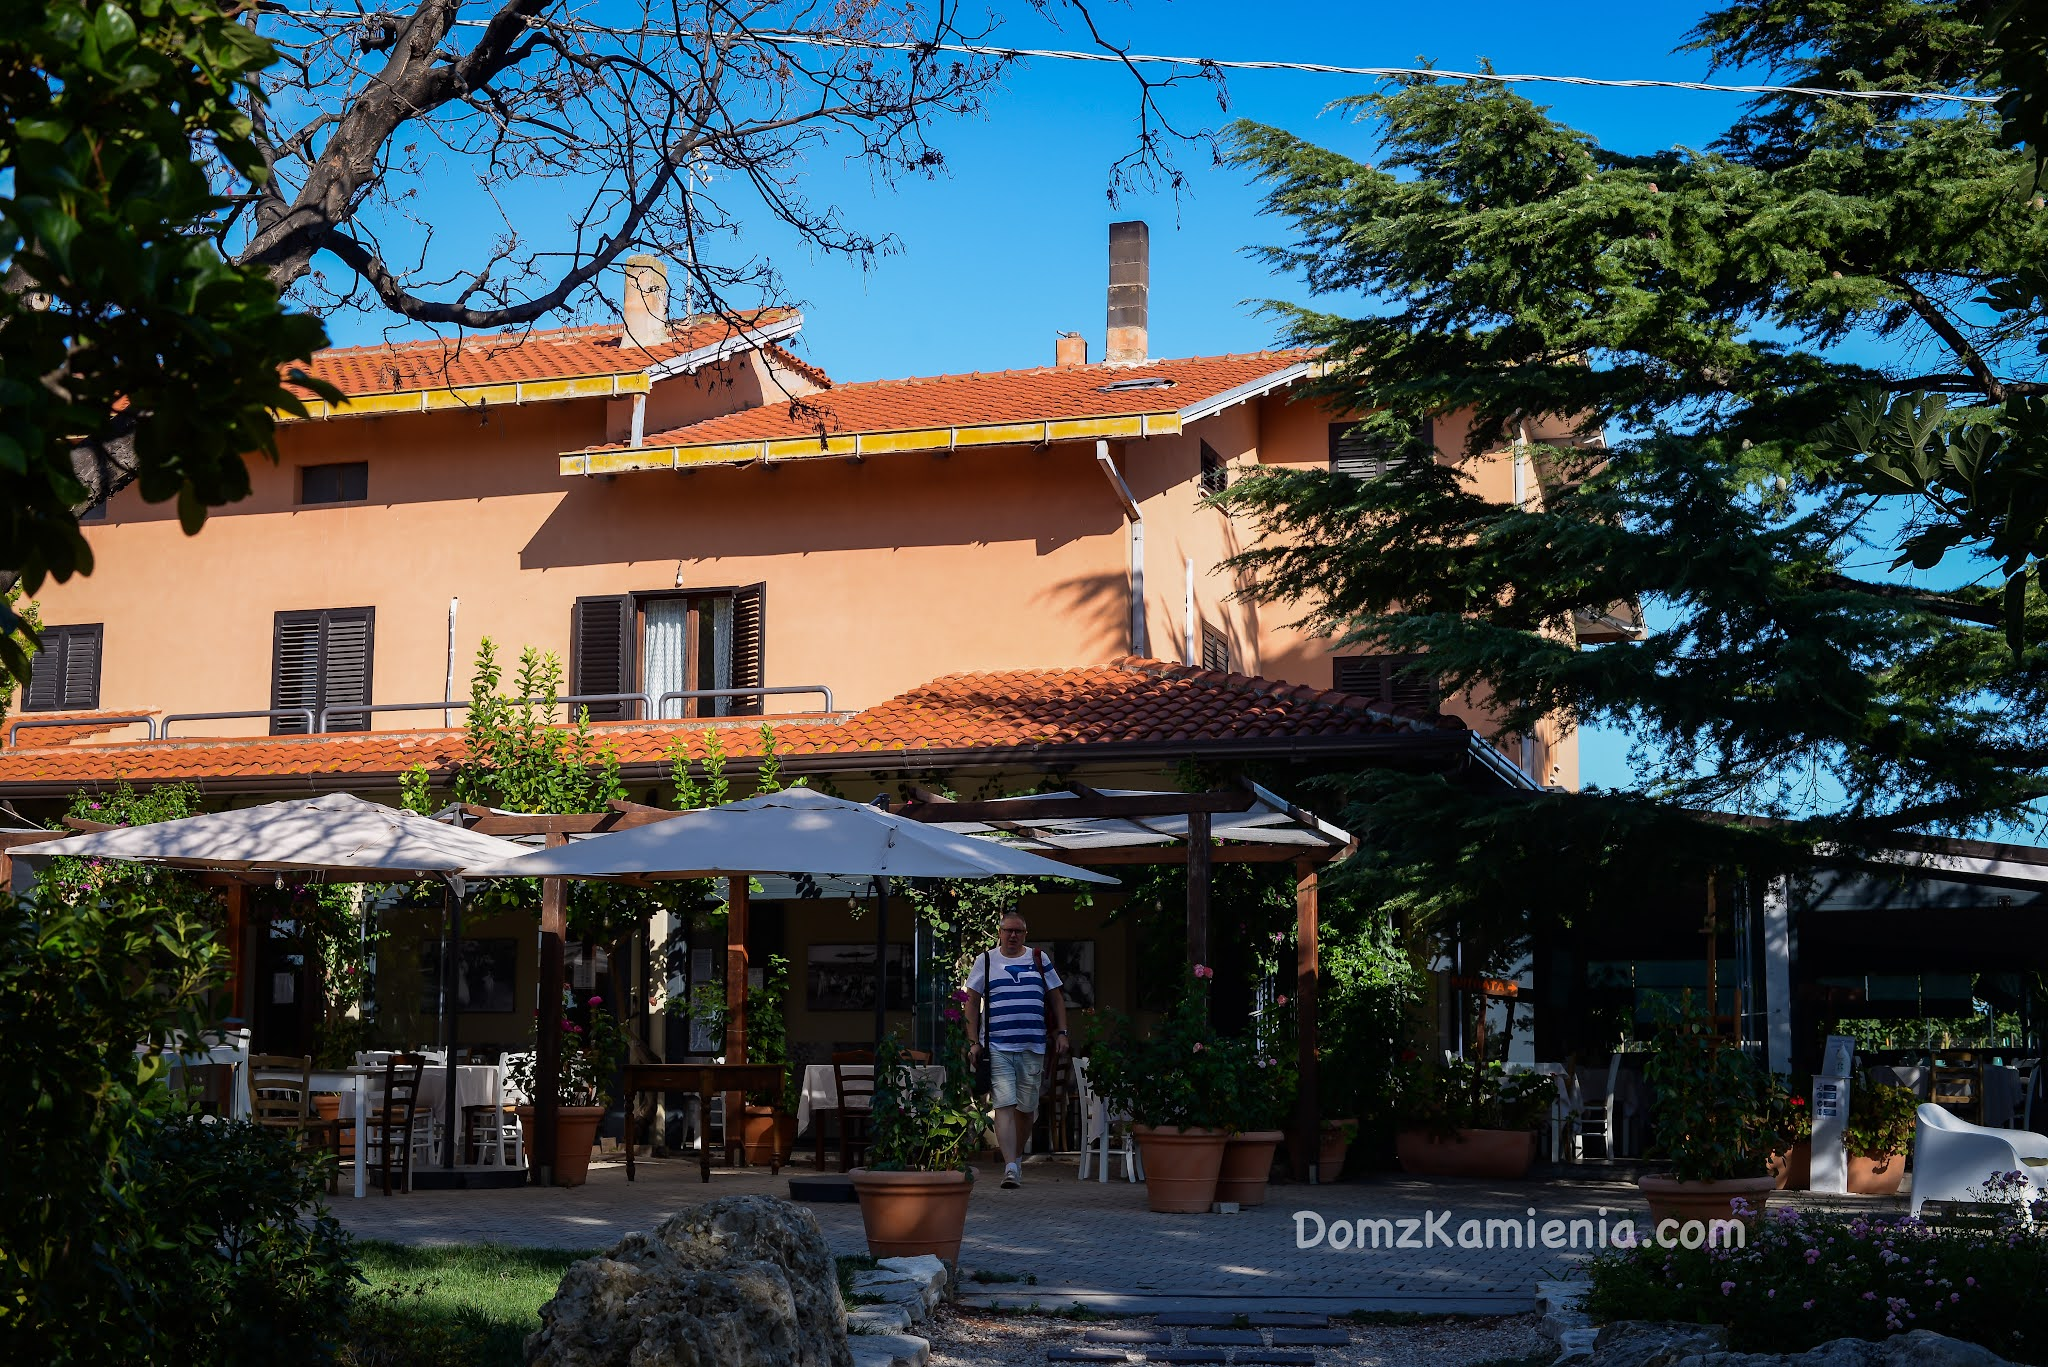 Santo Stefano Agriturismo Casalbordino - Dom z Kamienia blog